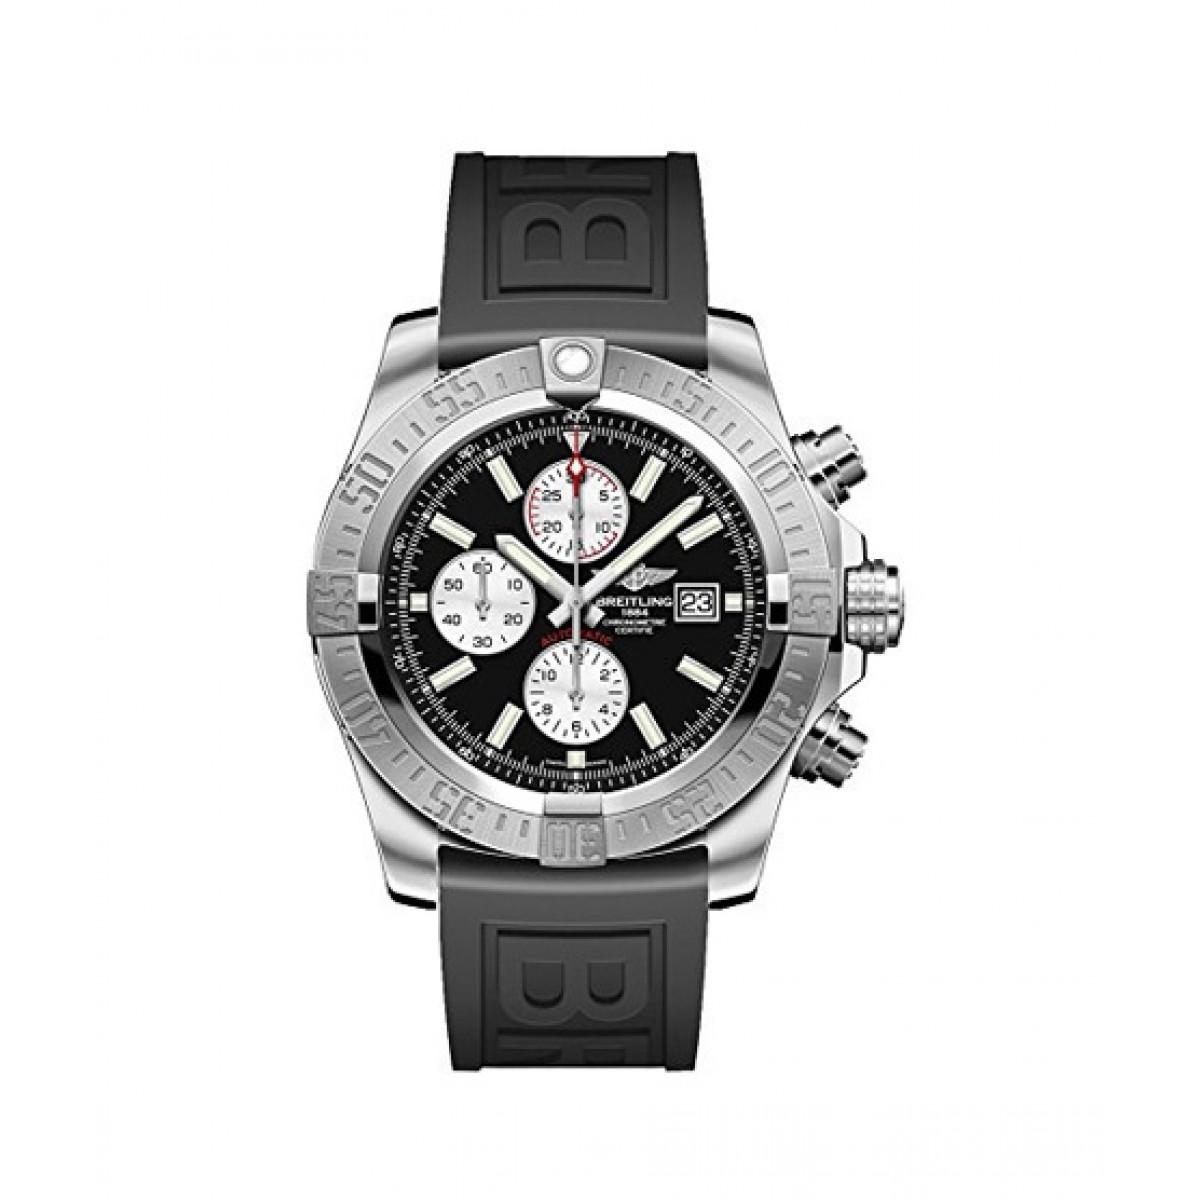 5fe0208c64e Breitling Super Avenger II Men s Watch Price in Pakistan